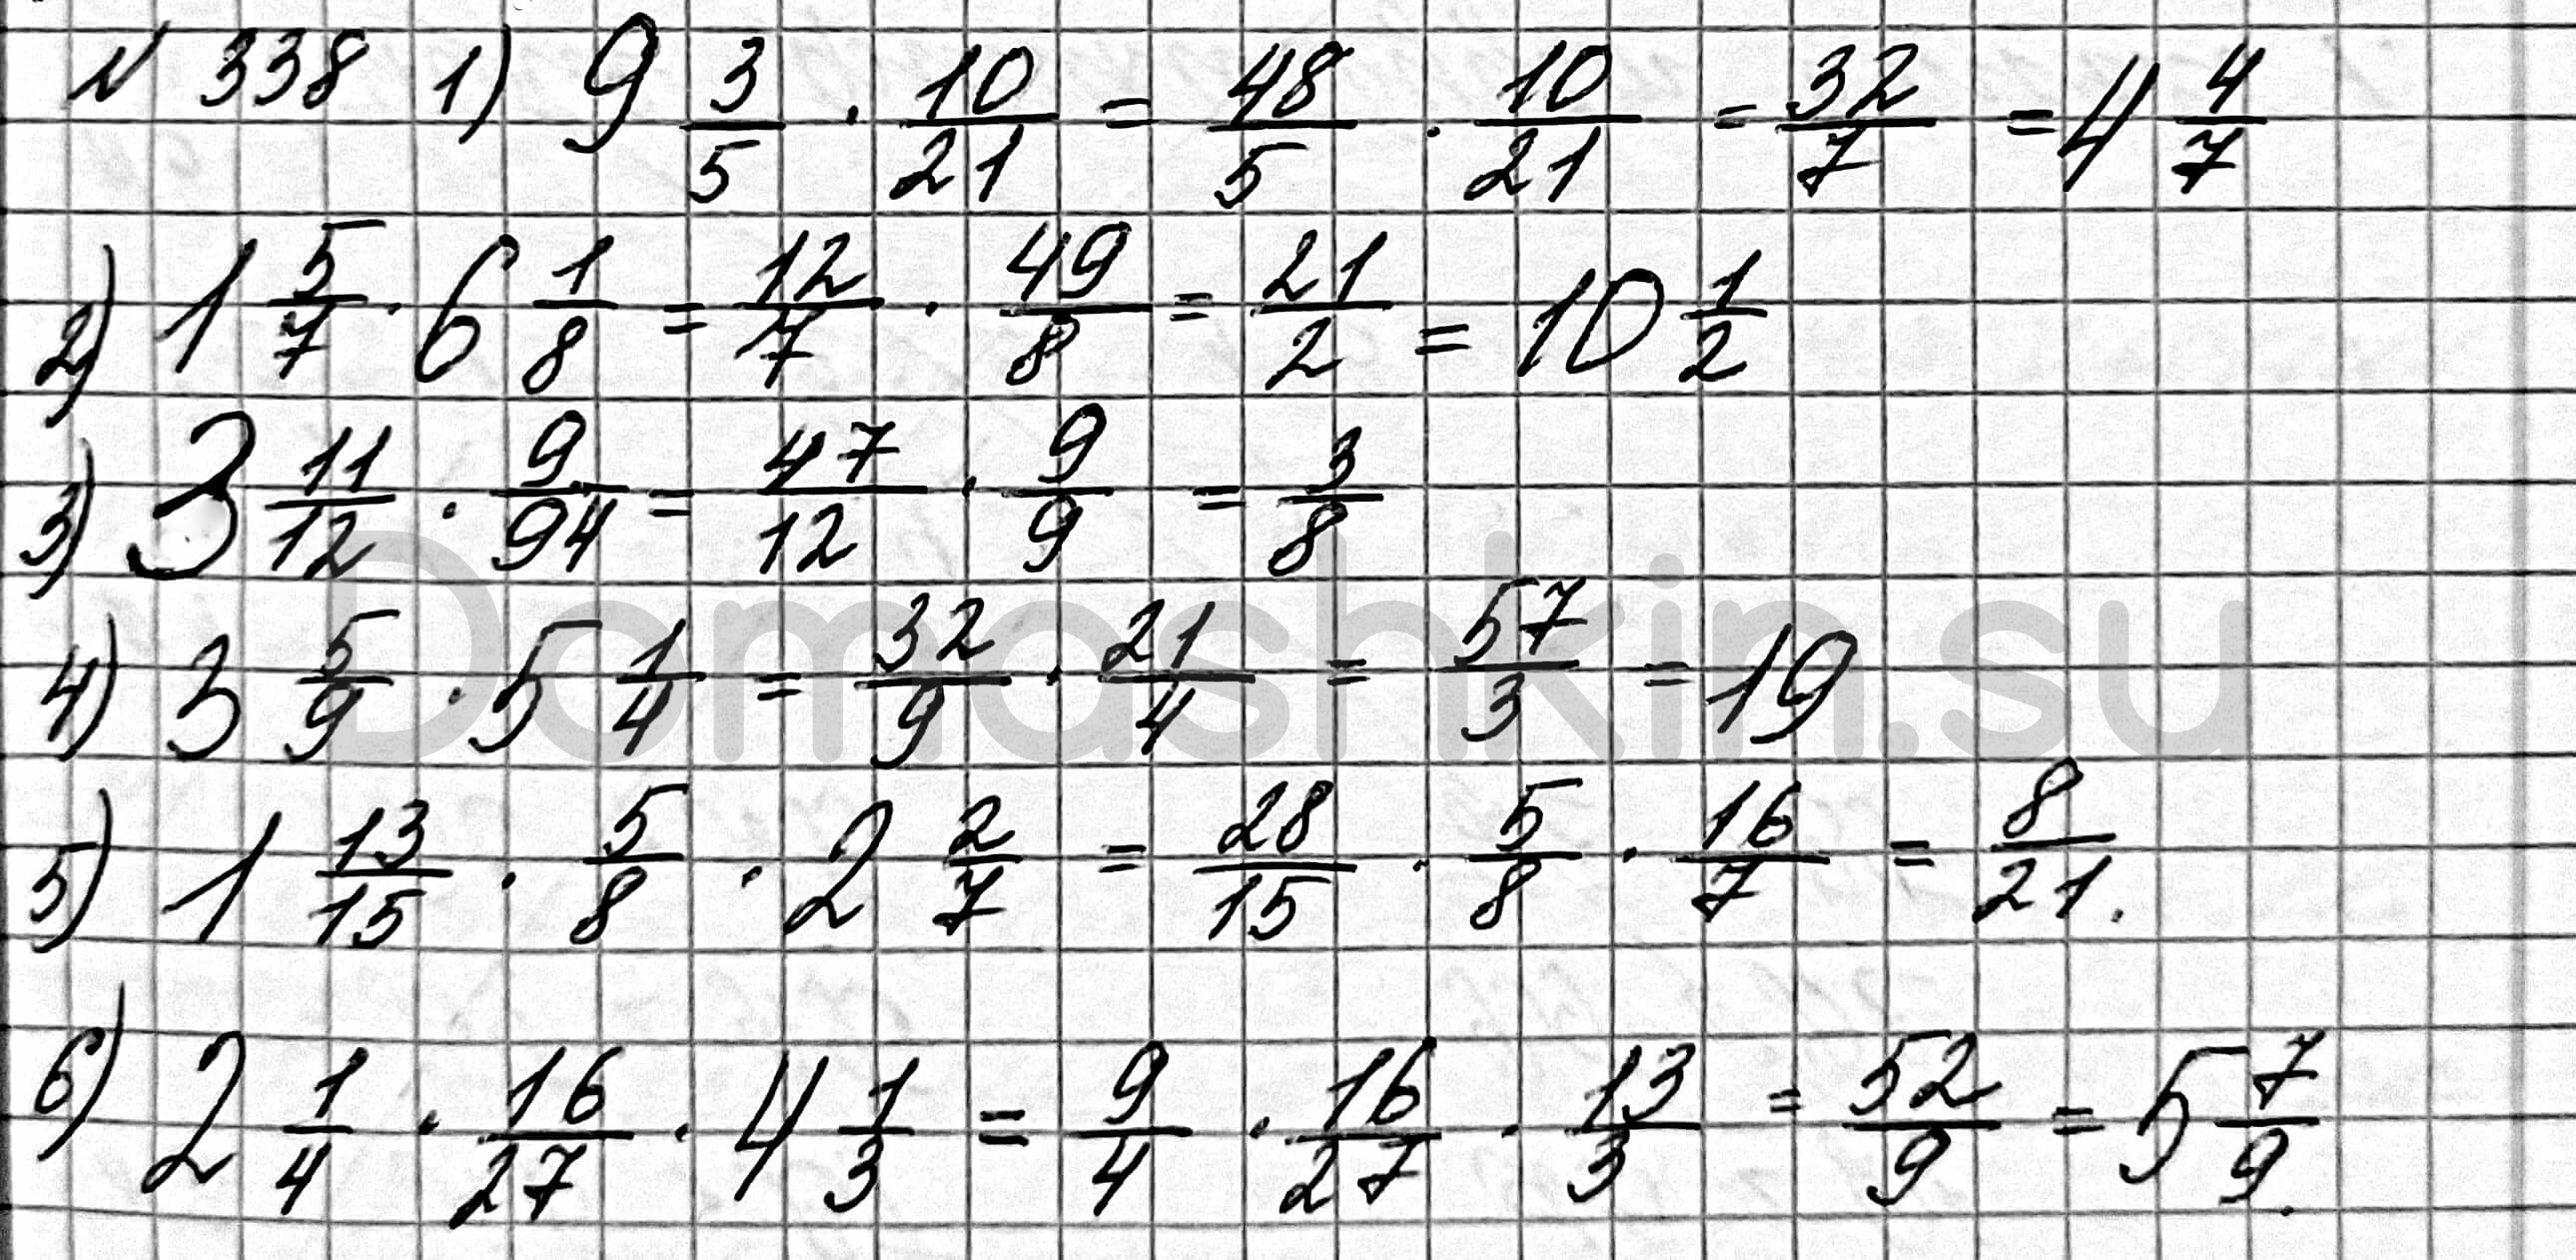 Математика 6 класс учебник Мерзляк номер 338 решение